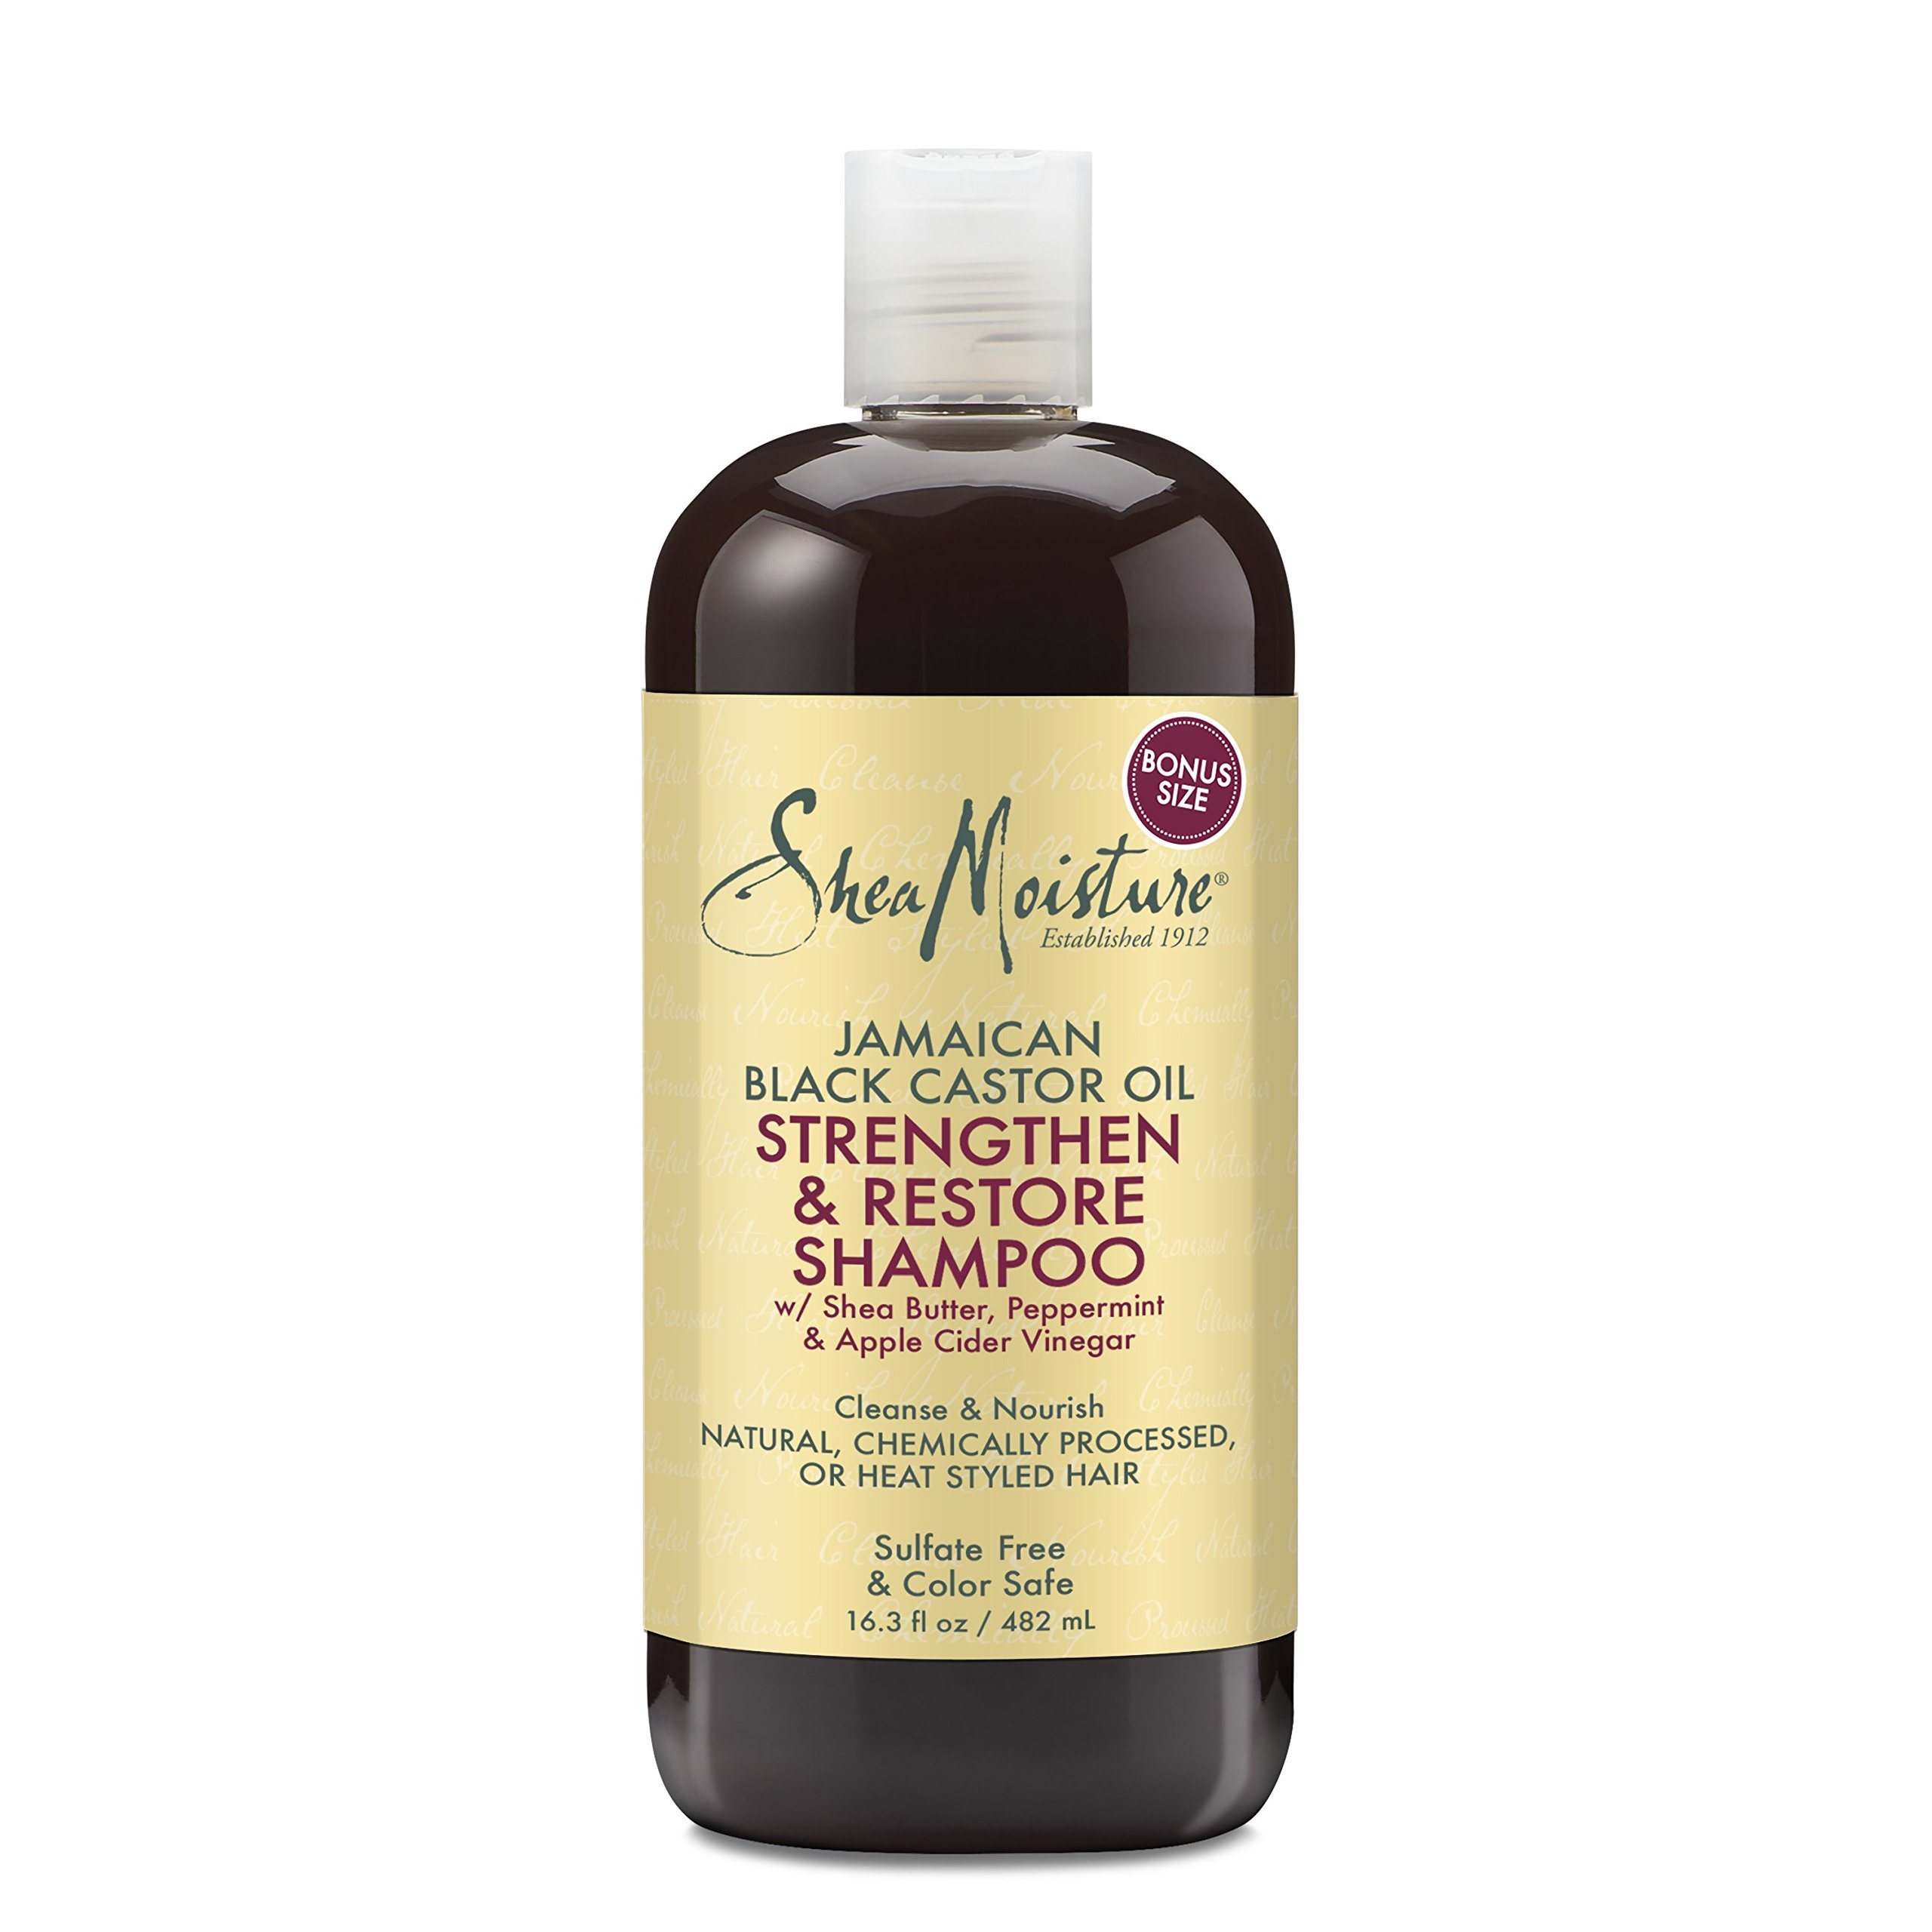 Shea Moisture  Strengthen, Grow & Restore Shampoo and Conditioner Set, Jamaican Black Castor Oil Combination Pack, 16.3 oz Shampoo & 13 oz. Conditioner by Shea Moisture (Image #5)